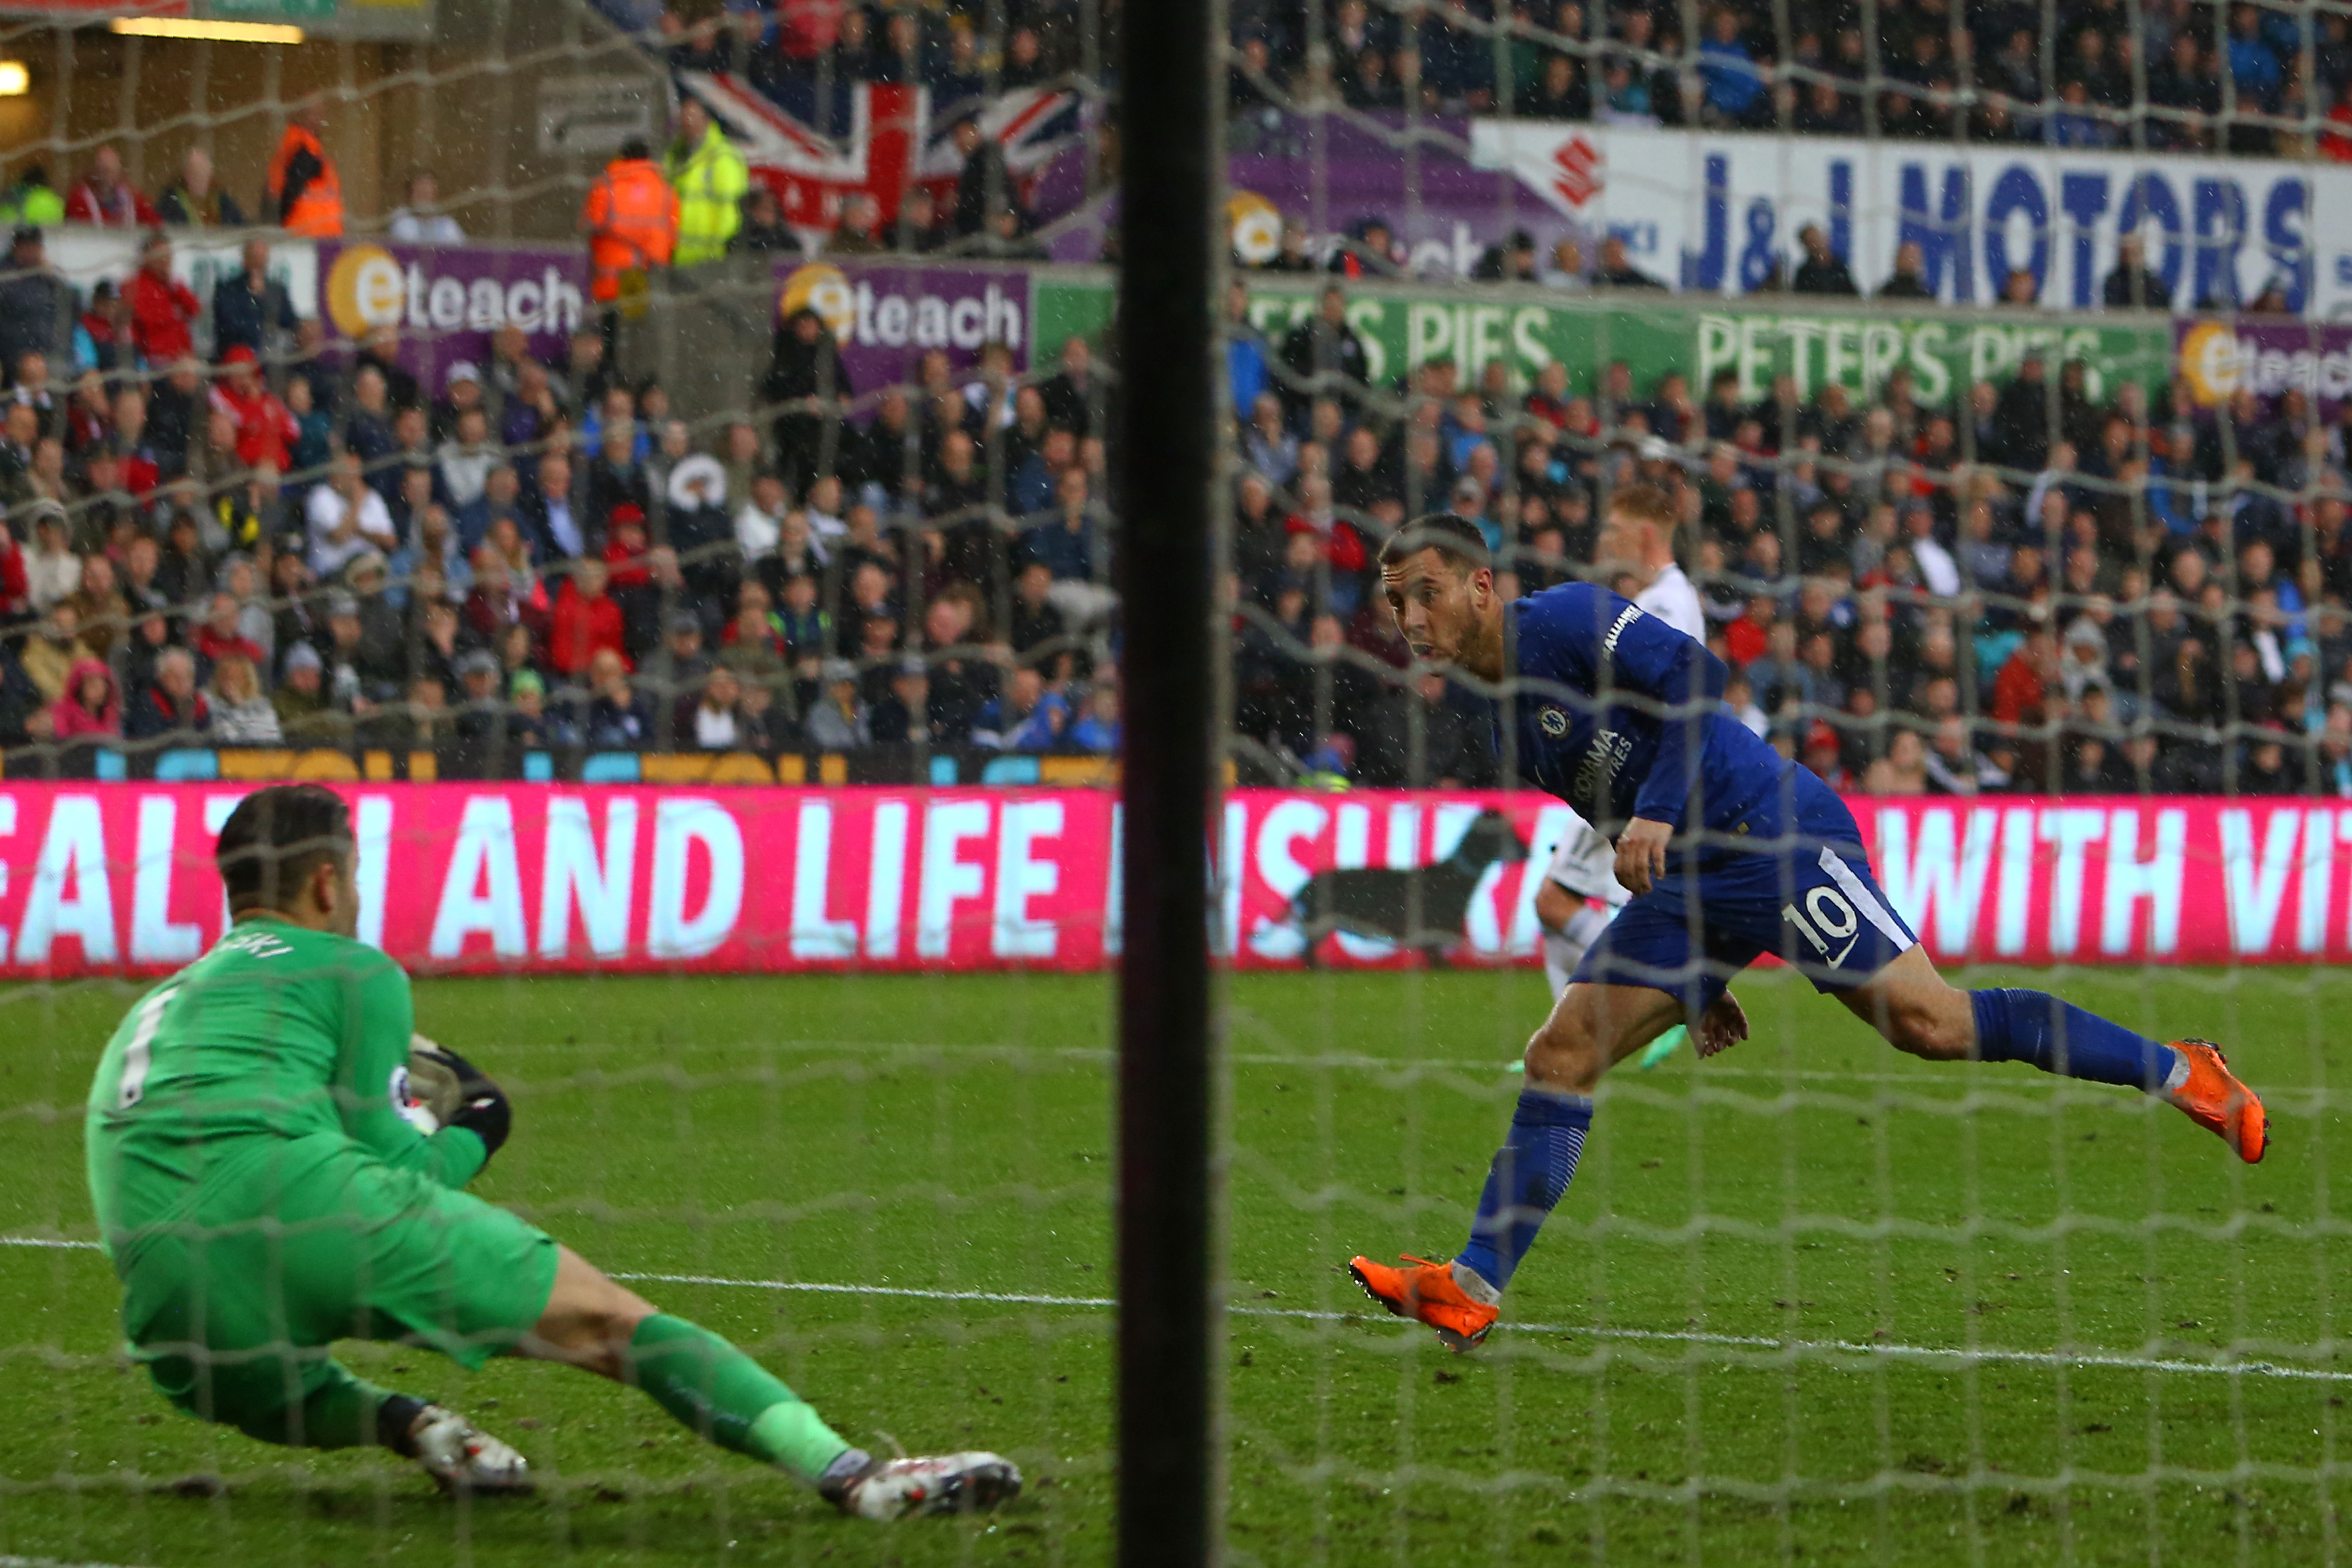 Lukasz Fabianski, Swansea City A.F.C., Premier League, Fantasy Premier League, Gameweek 37